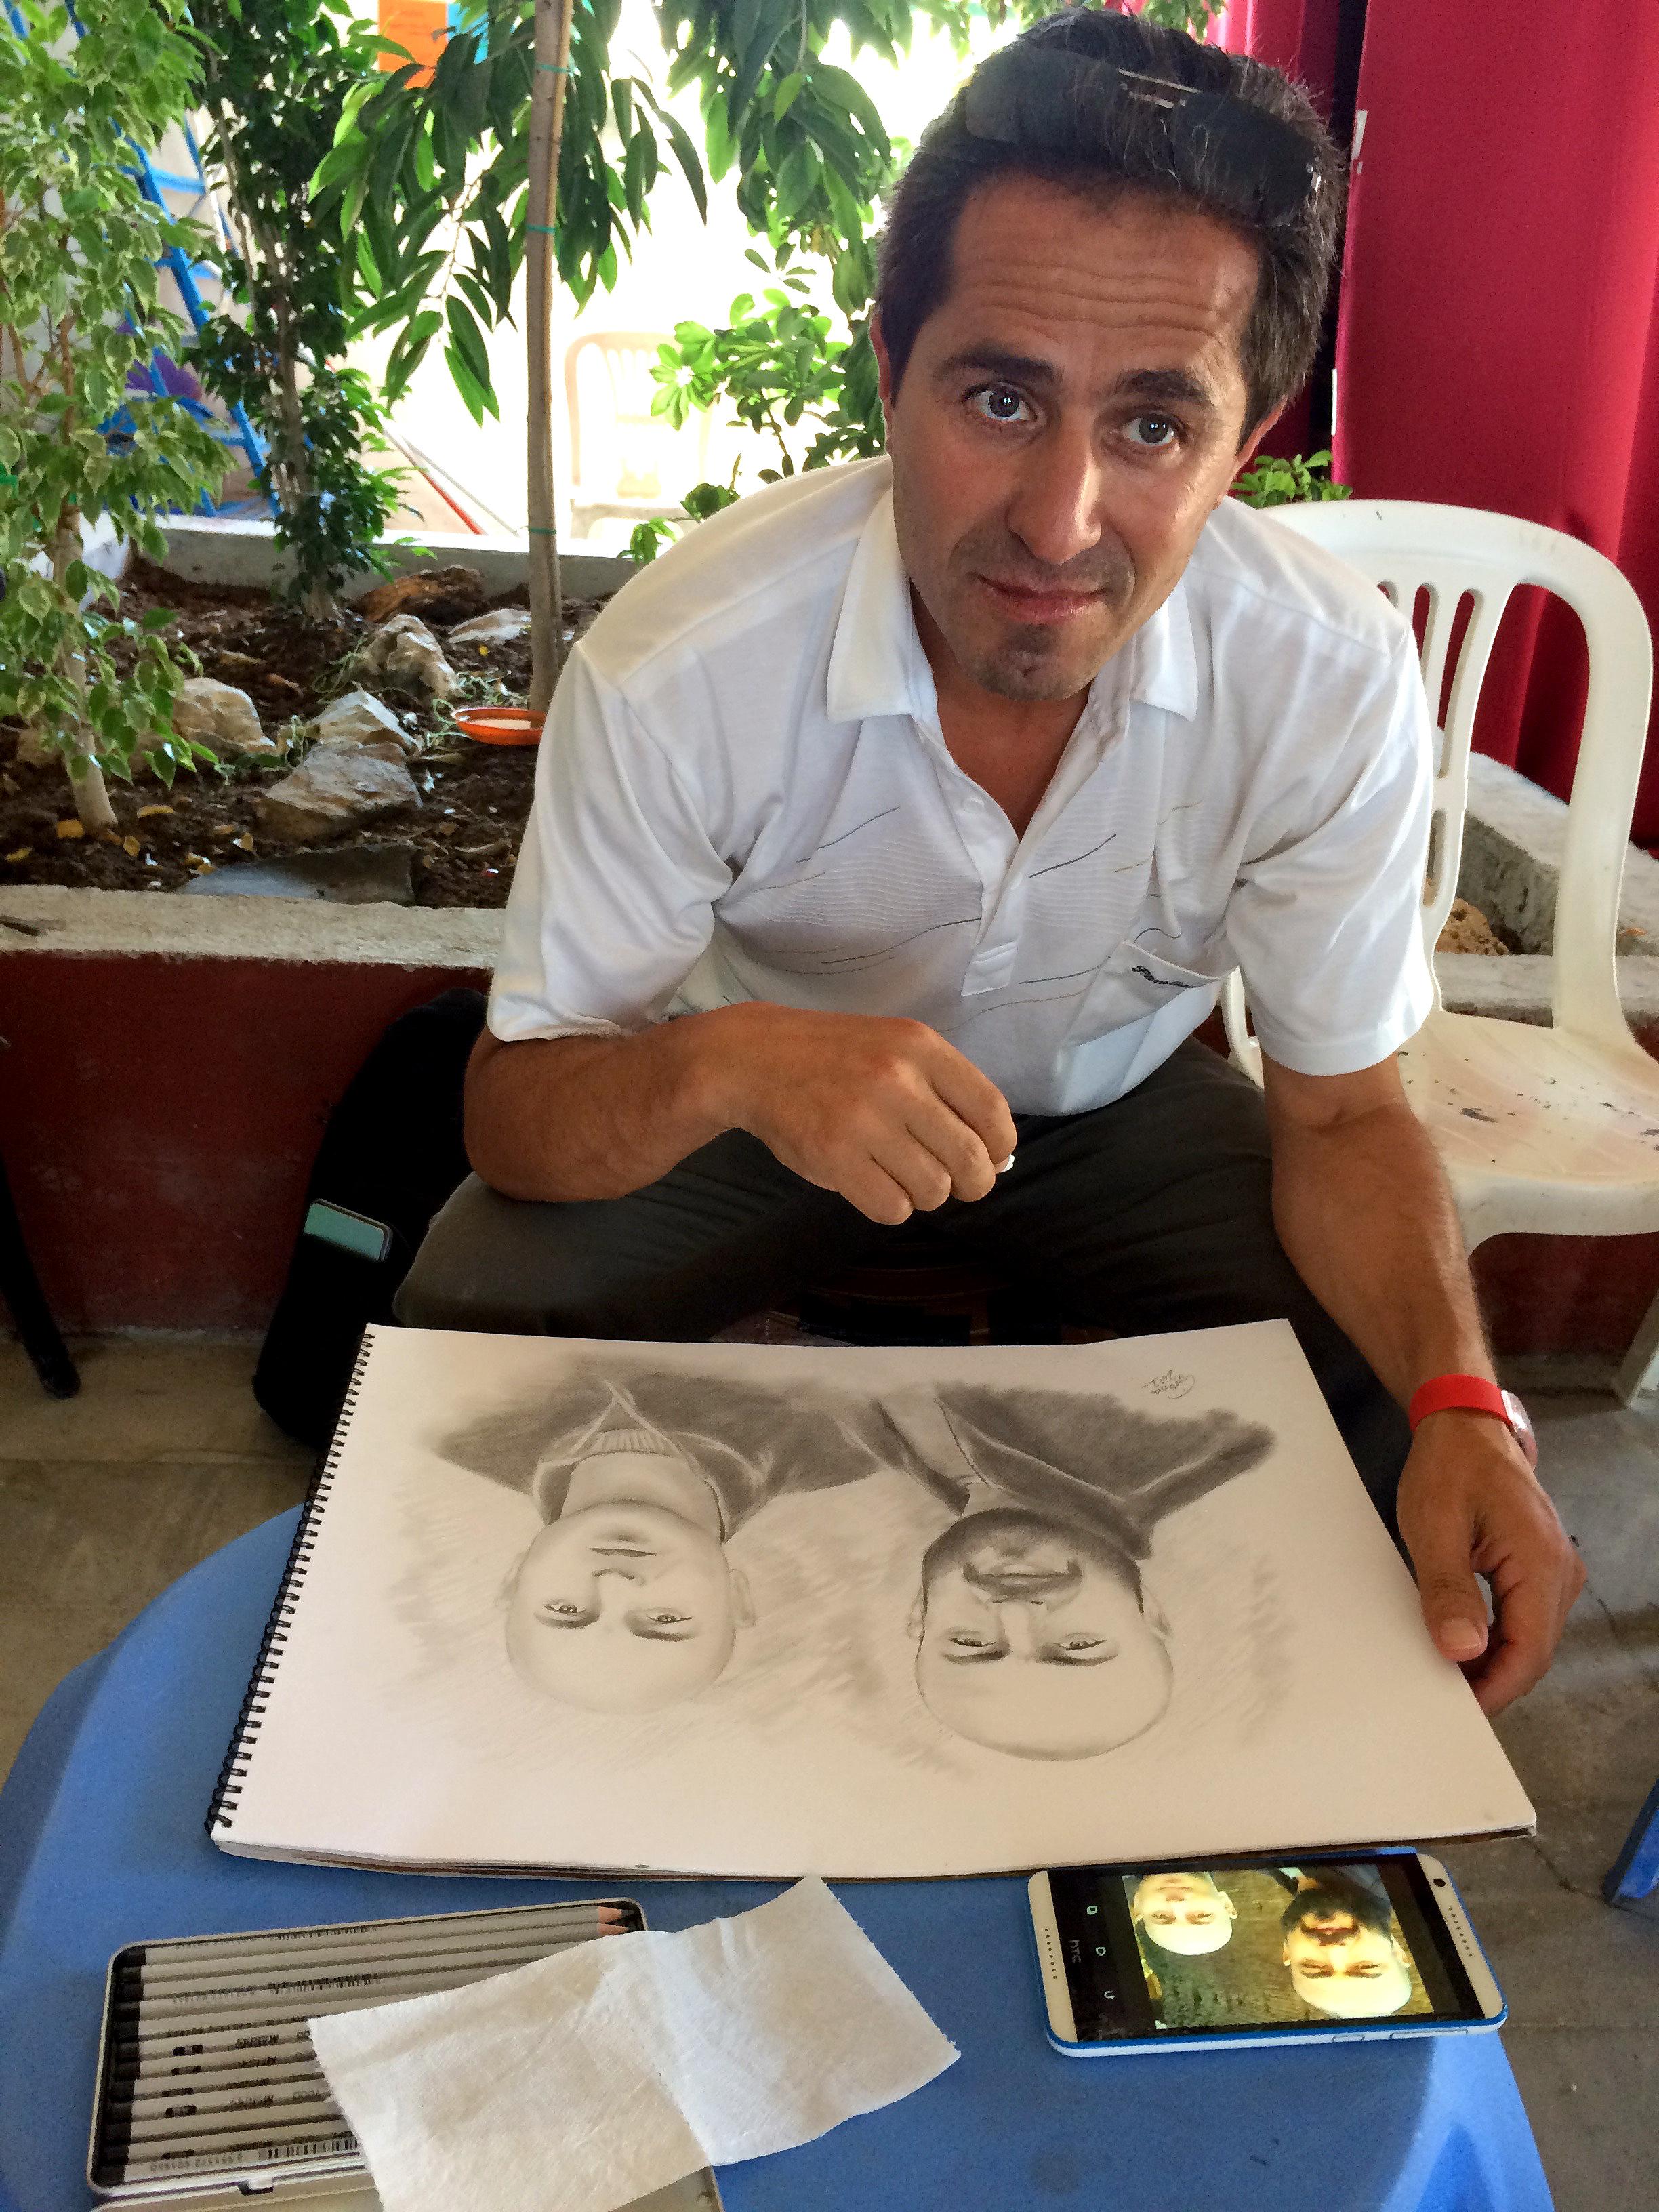 Mahmud the muralist and artist